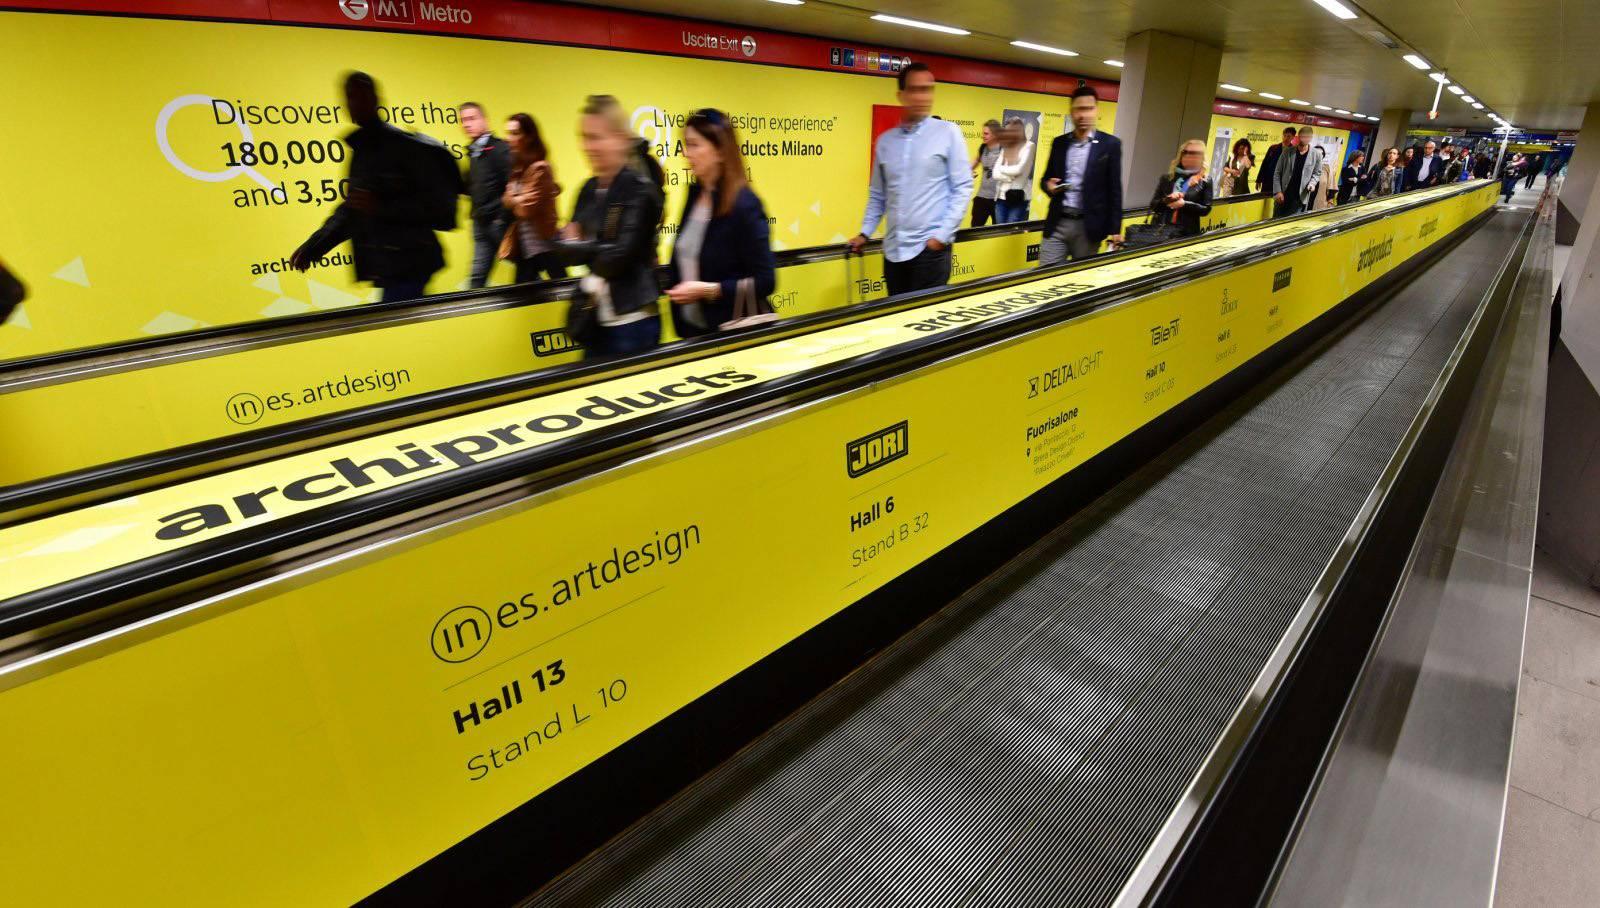 Pubblicità metro Milano Station Domination Rho-Edilportale-Design Week-IGPDecaux